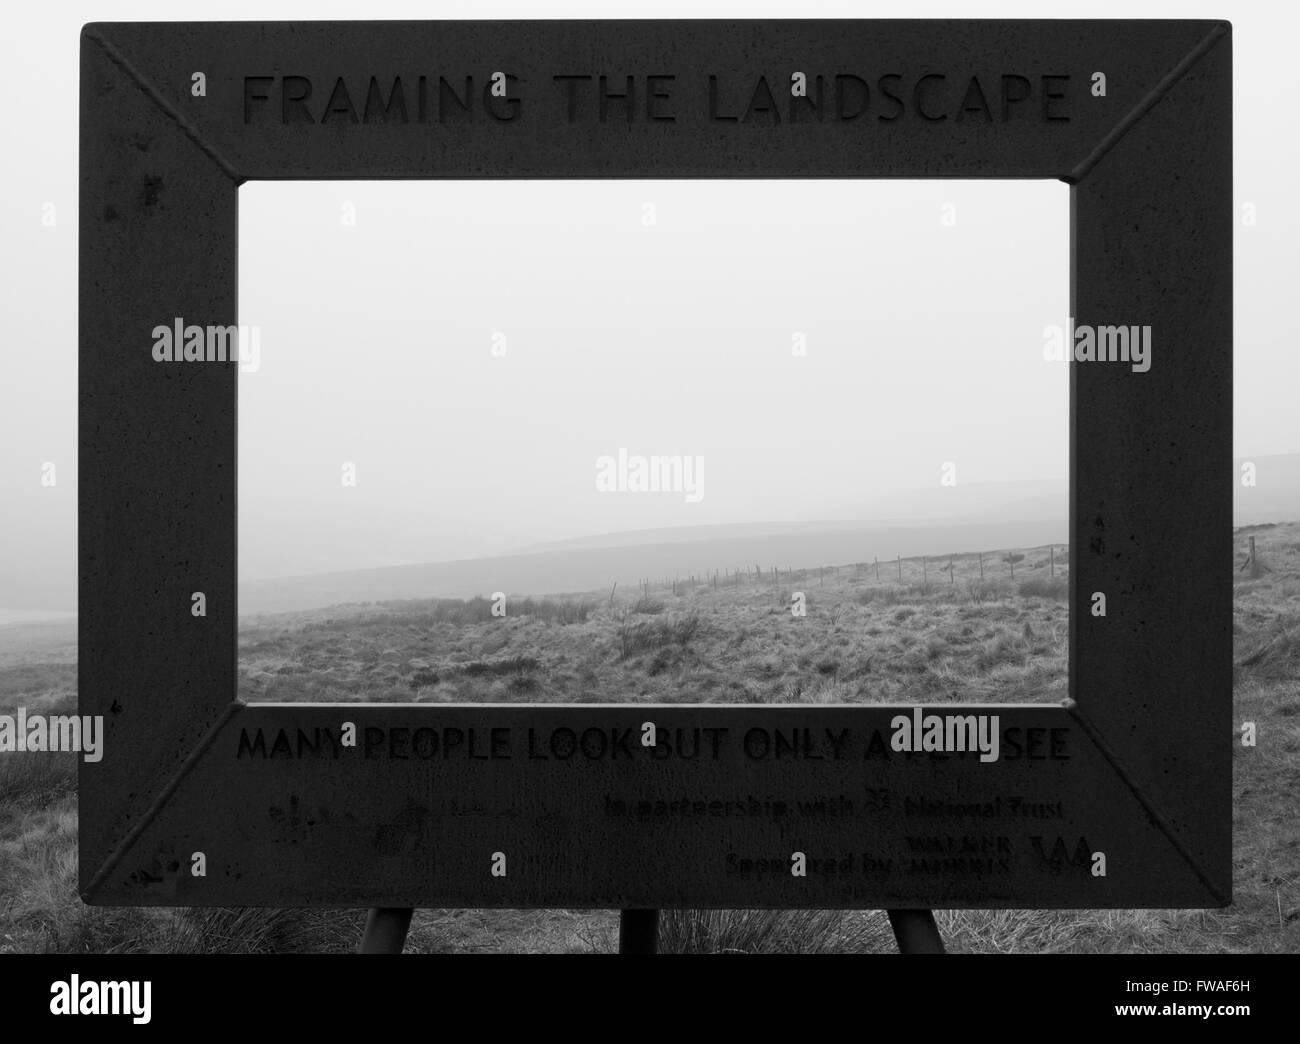 Framing Landscape Stock Photos & Framing Landscape Stock Images - Alamy